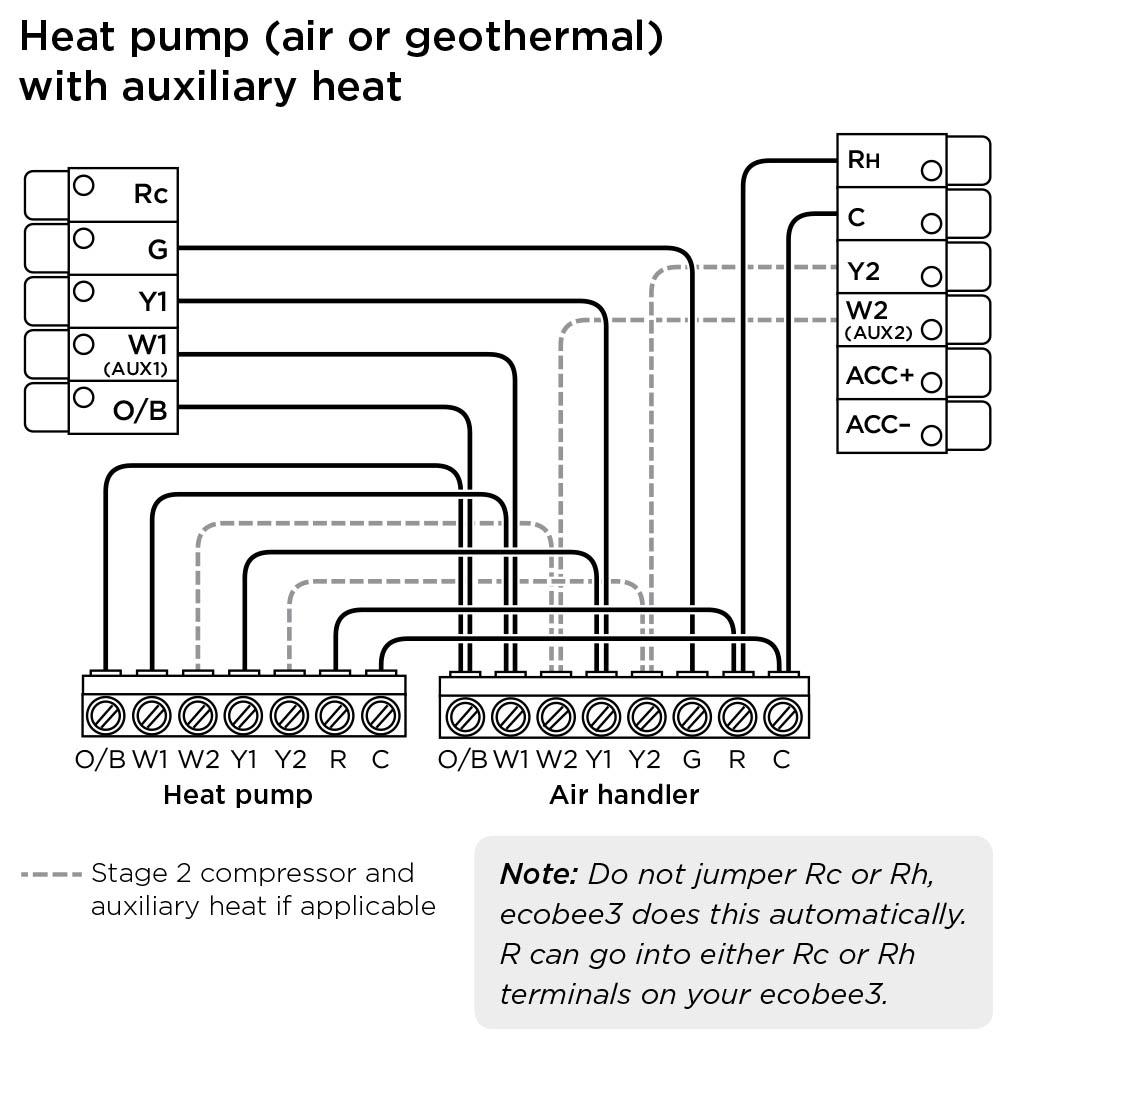 Ecobee3 Wiring Diagrams – Ecobee Support - Heat Pump Wiring Diagram